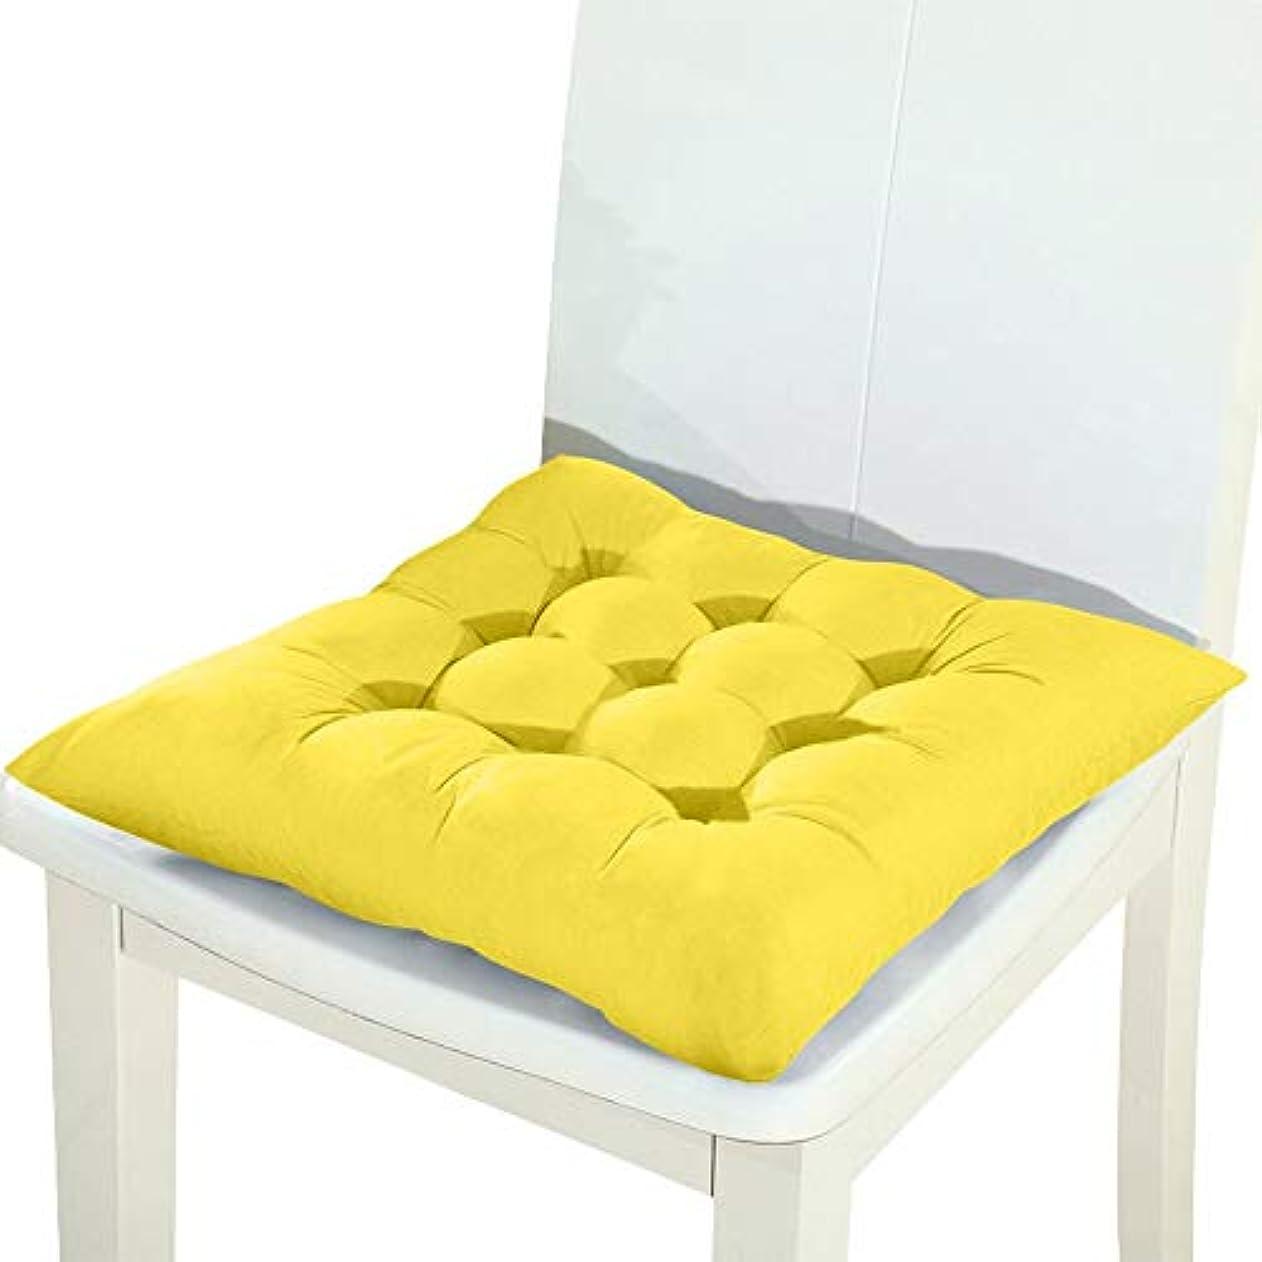 LIFE 1/2/4 個冬オフィスバー椅子バックシートクッションシートクッションパッドソファ枕臀部椅子クッション 37 × 37 センチメートル クッション 椅子